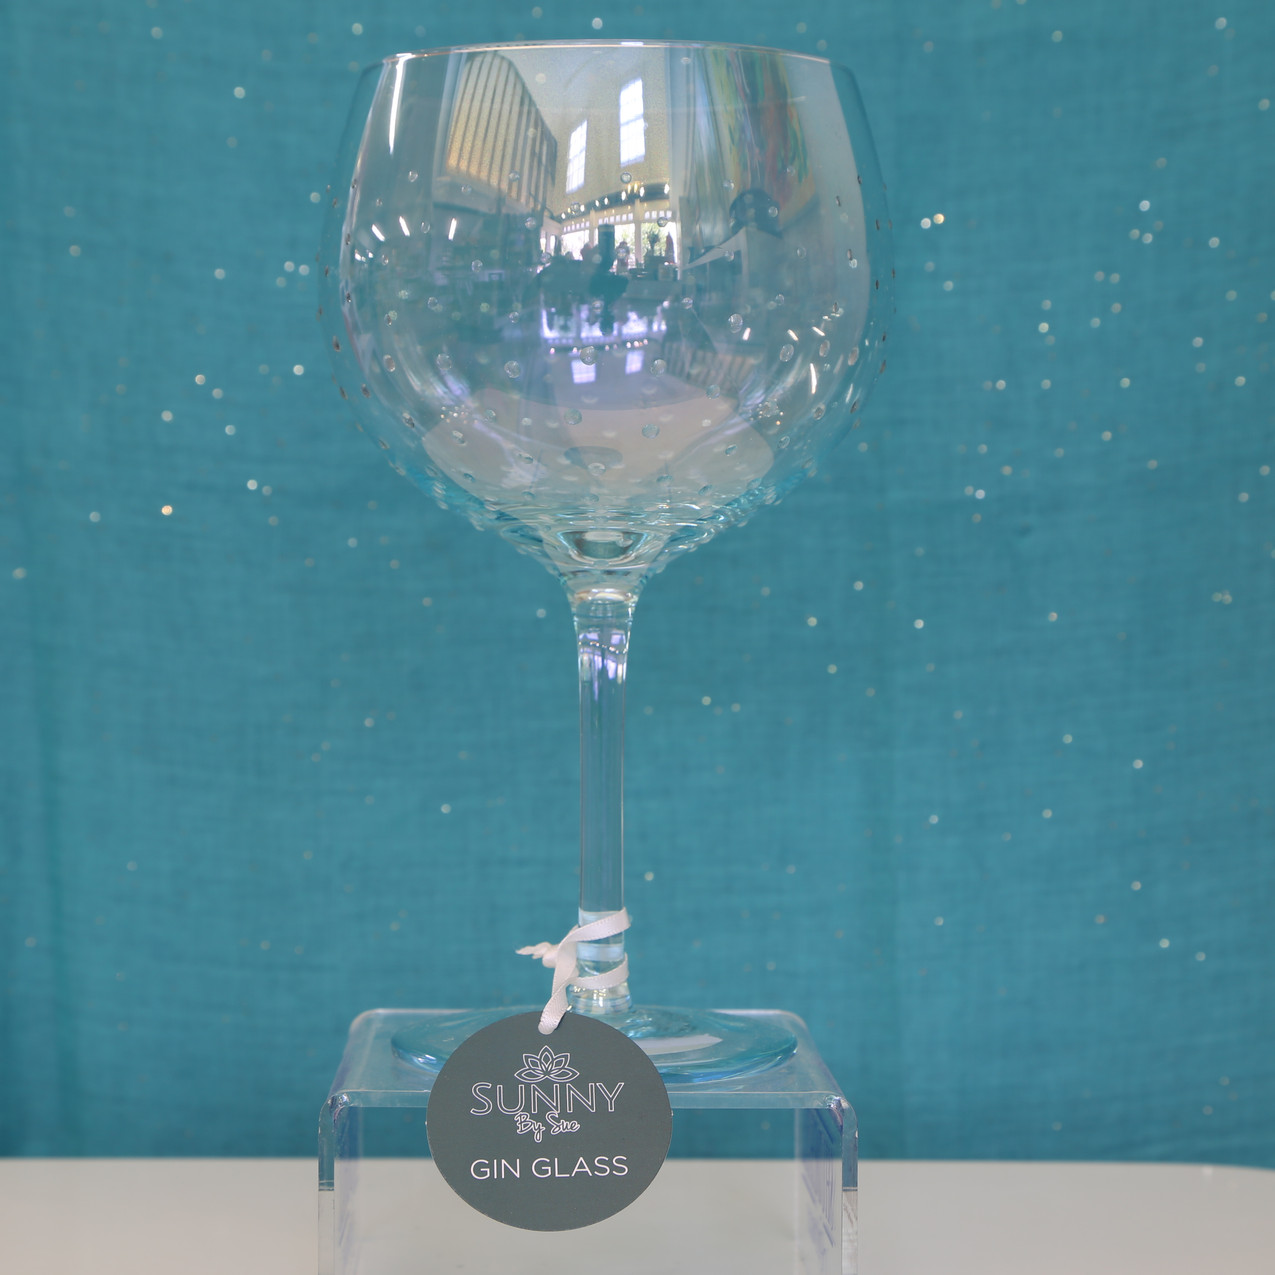 Gin Glass clear